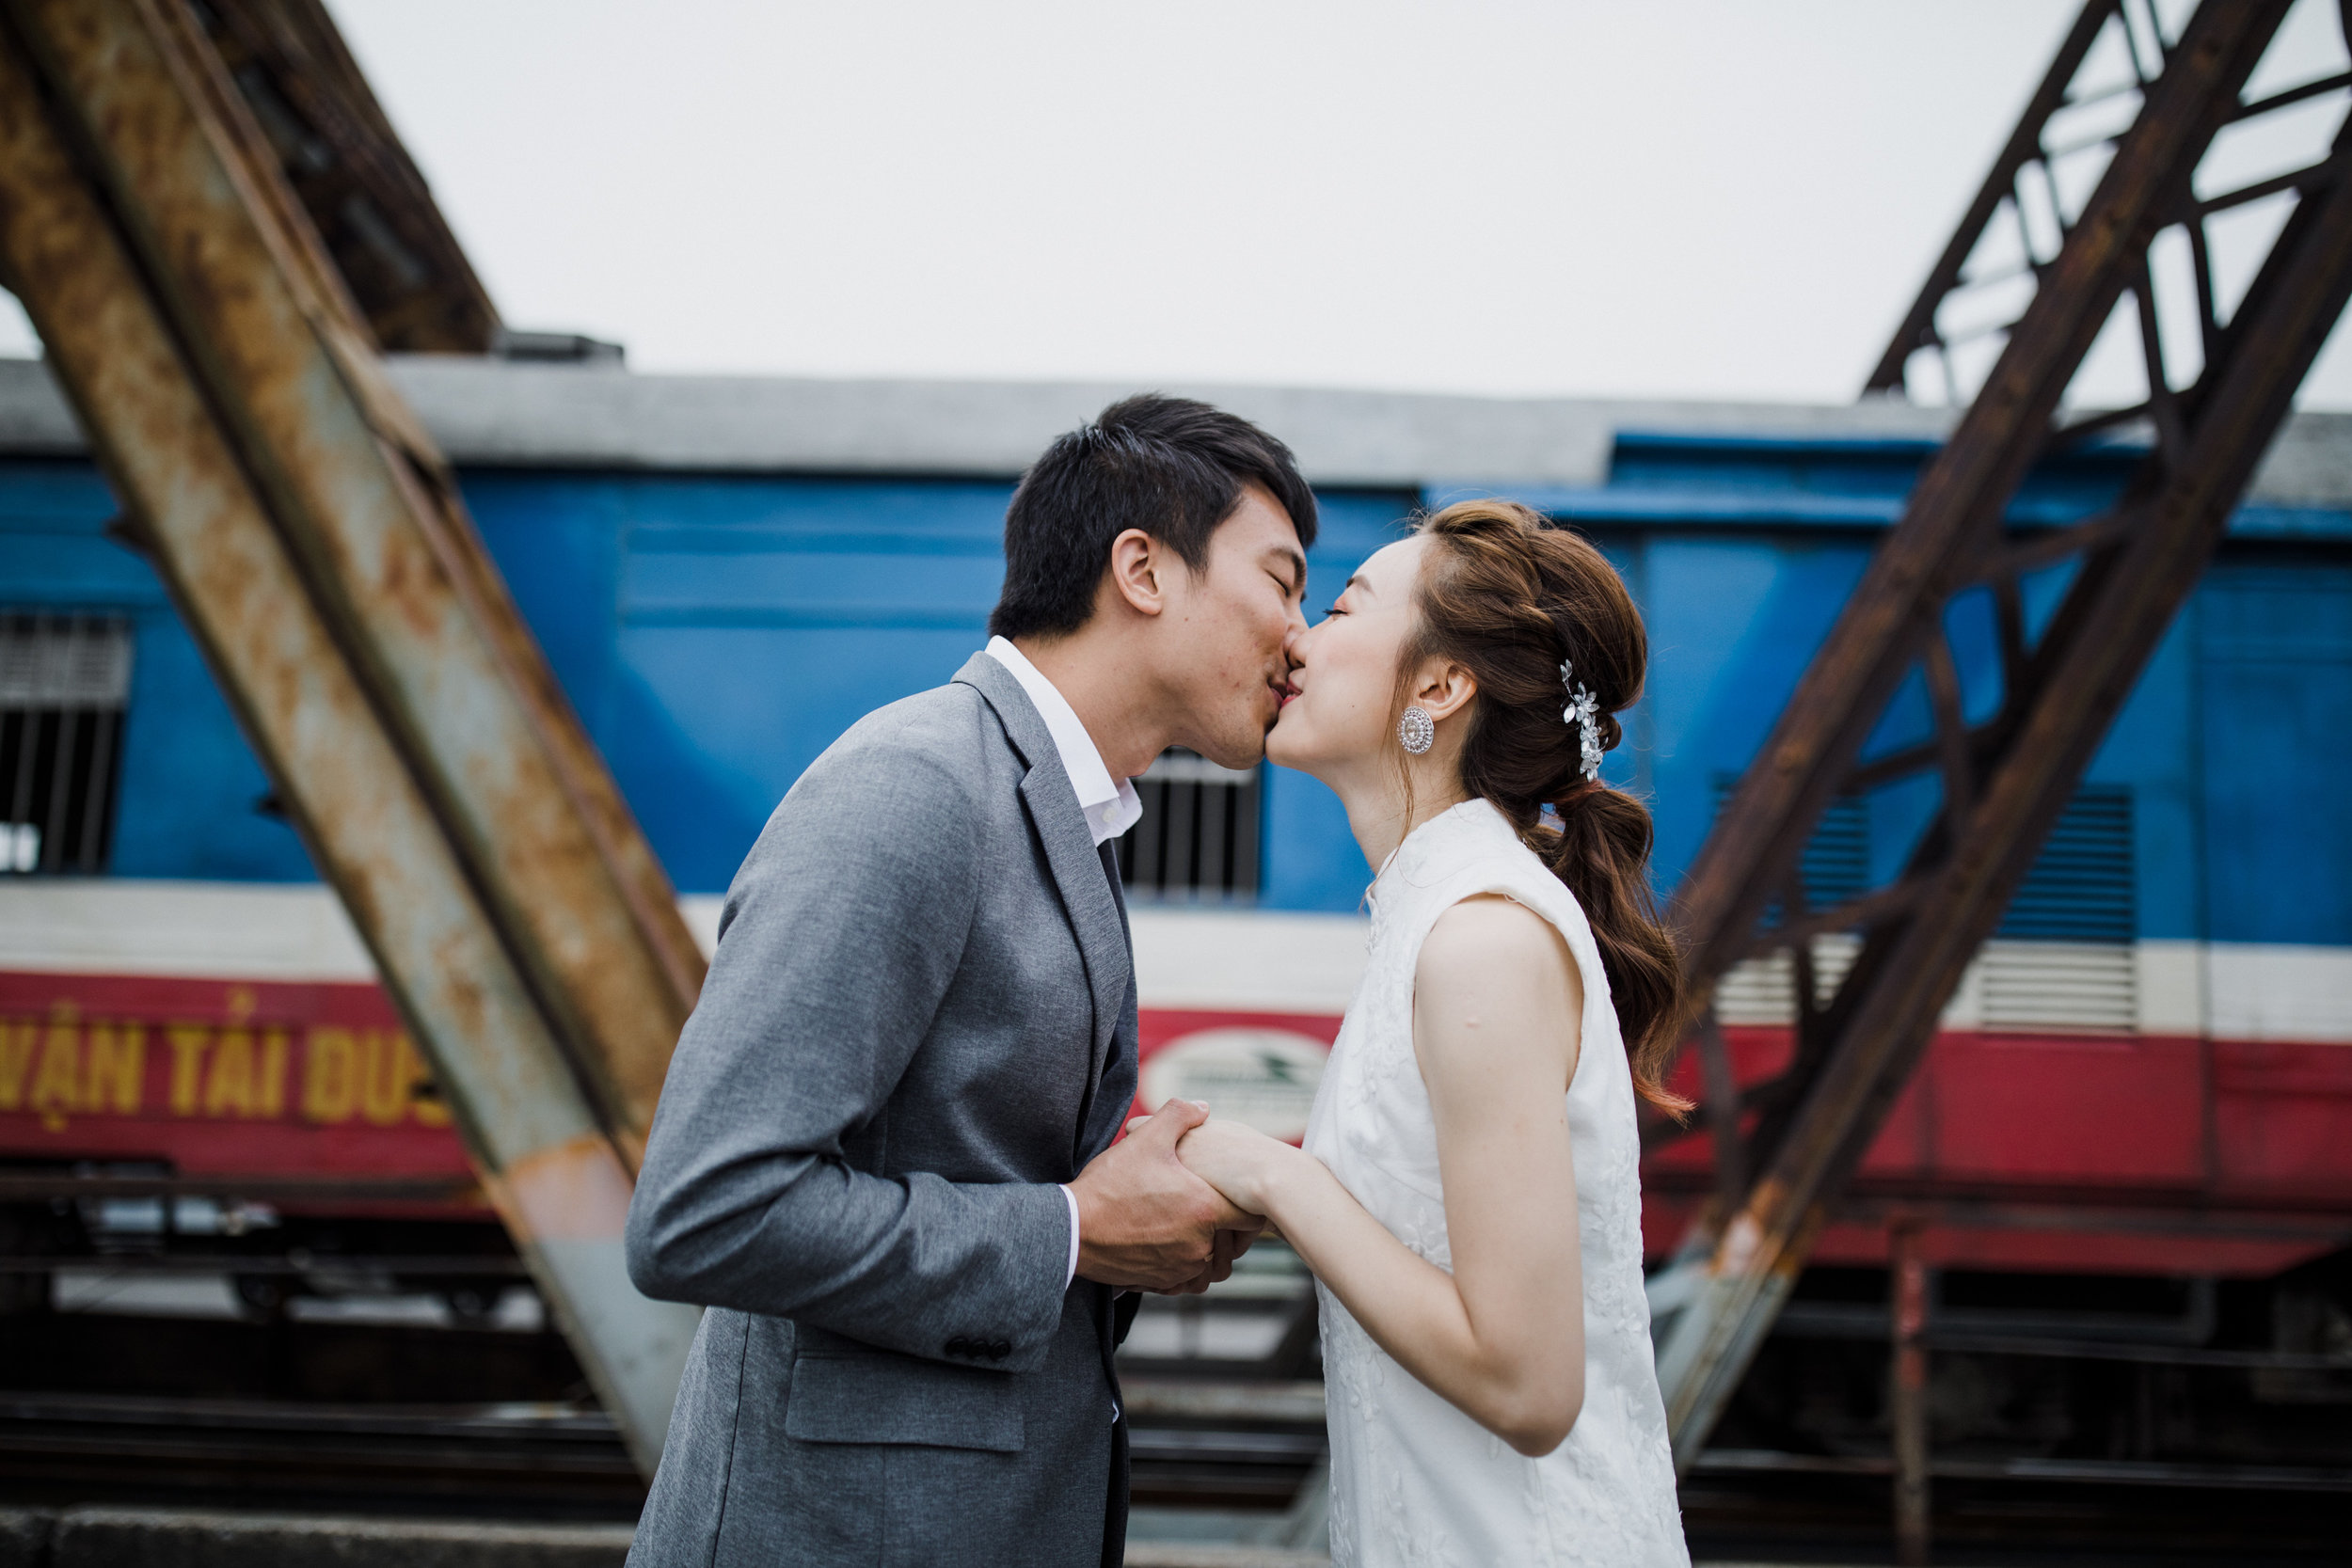 justinwong_prewedding_mottvisualsweddings-0803.jpg